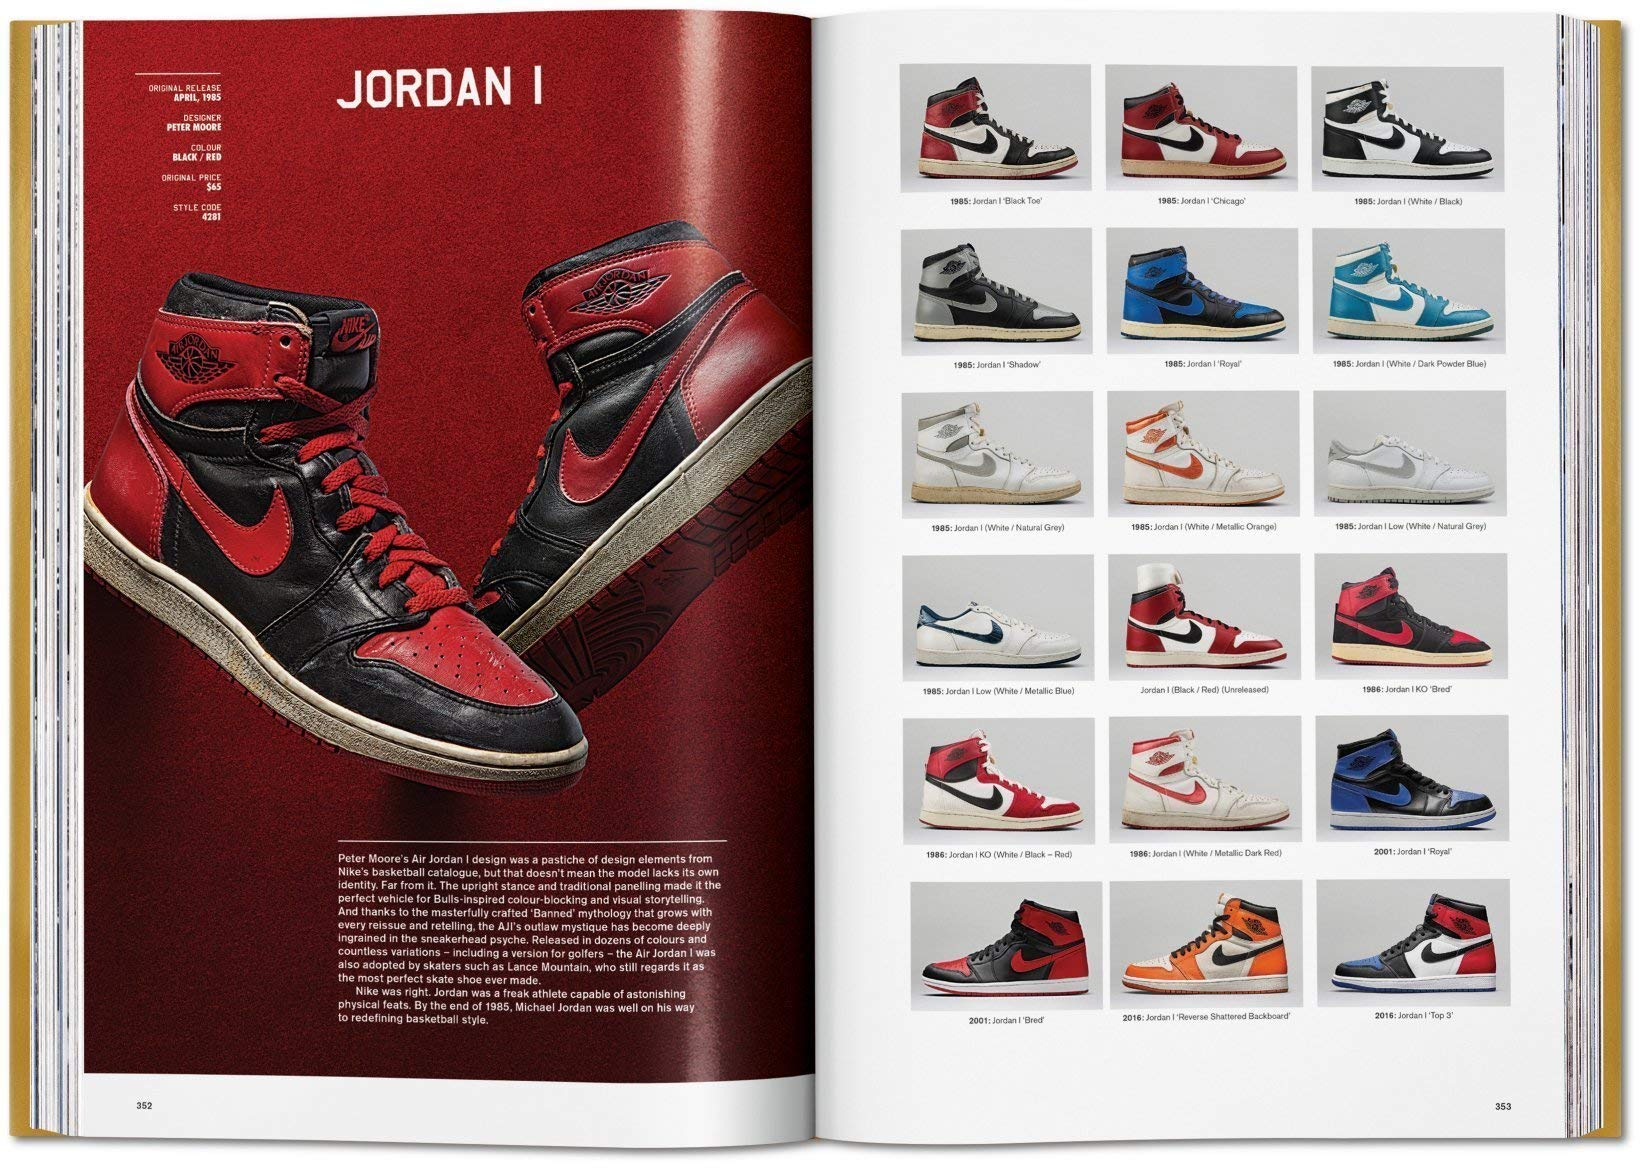 Sneaker freaker : The ultimate sneaker book